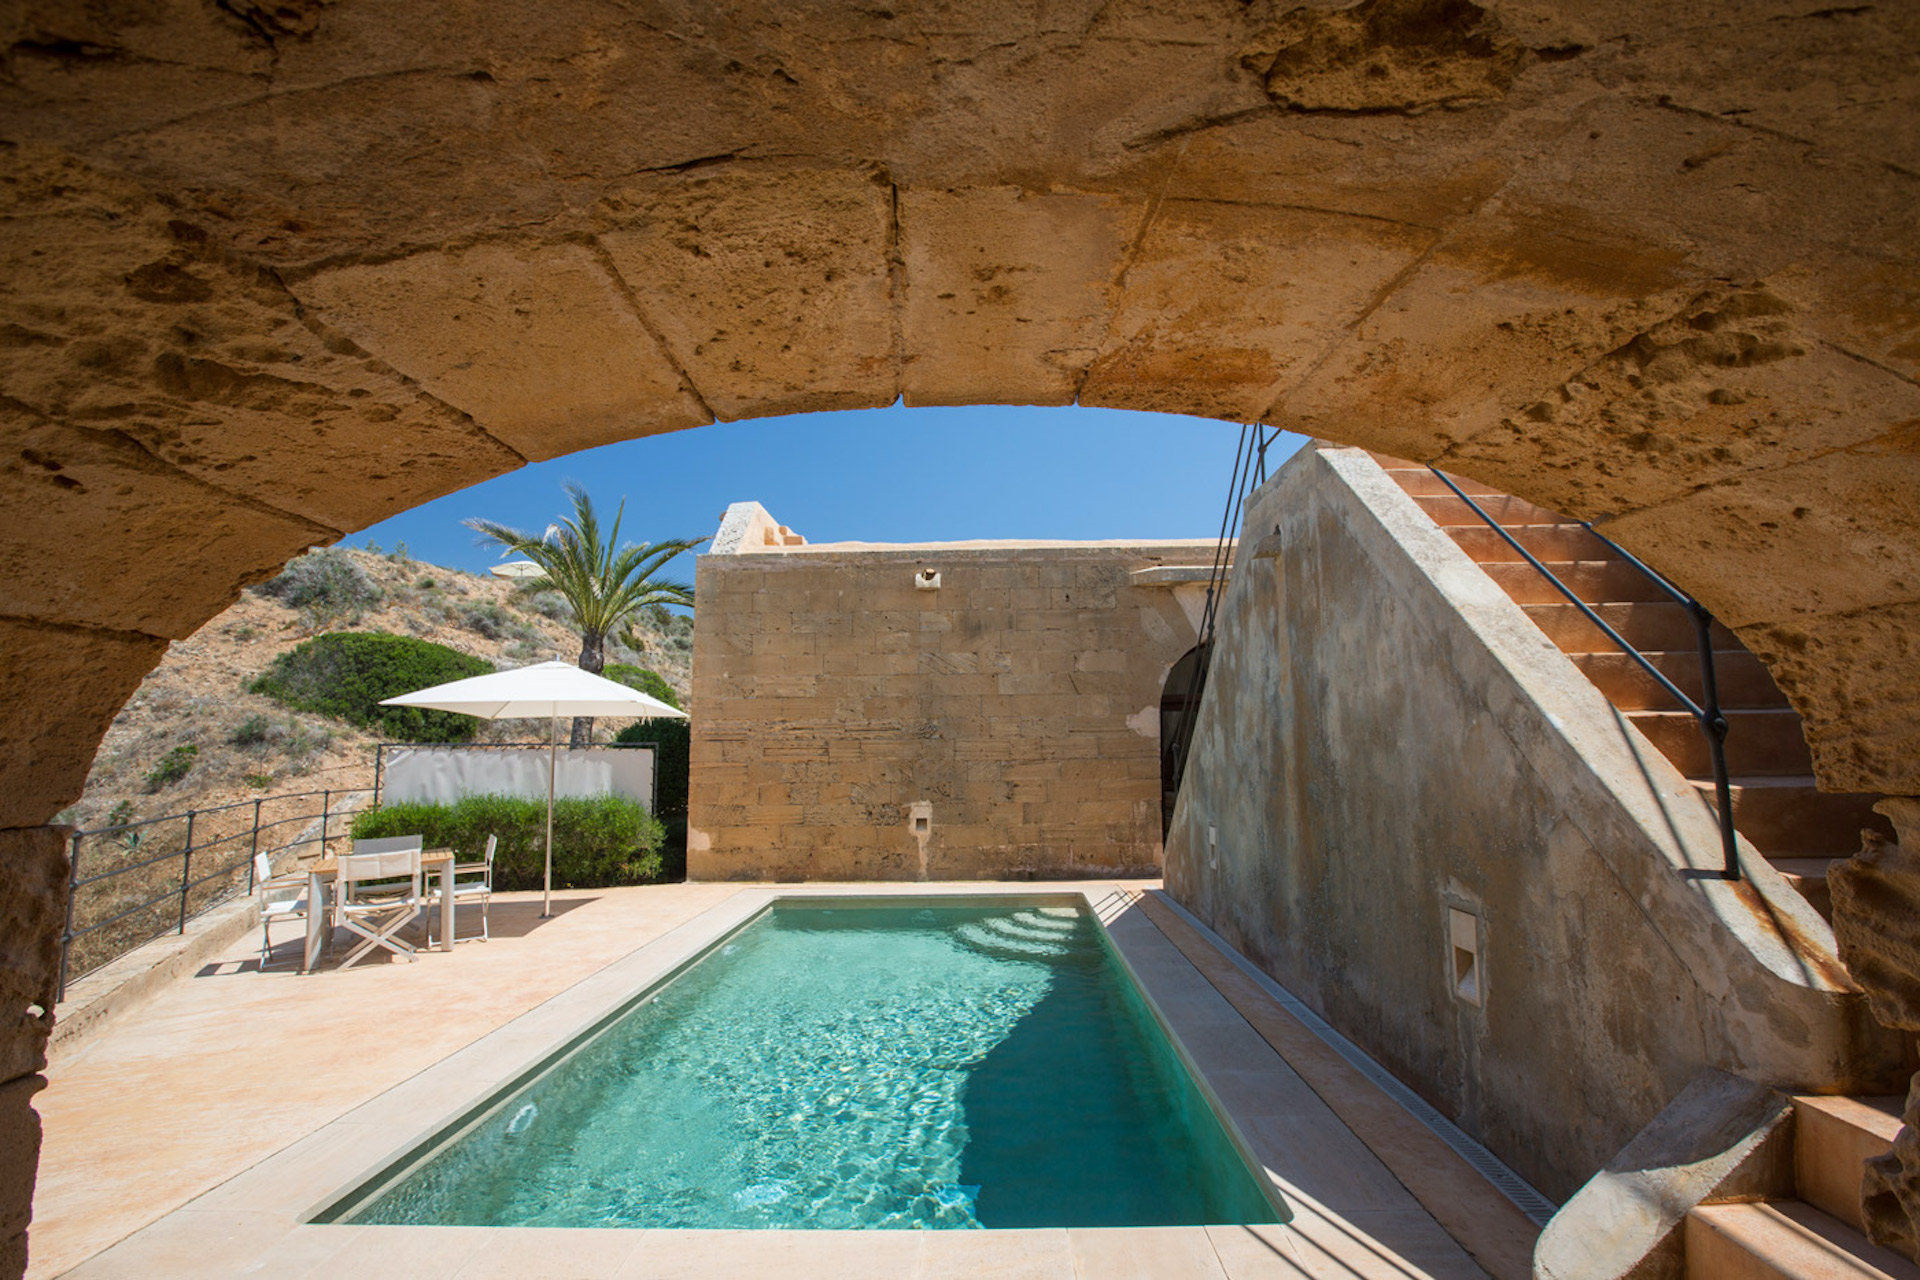 Cap Rocat - Ancient Spanish Fortress - Humphrey Munson Blog